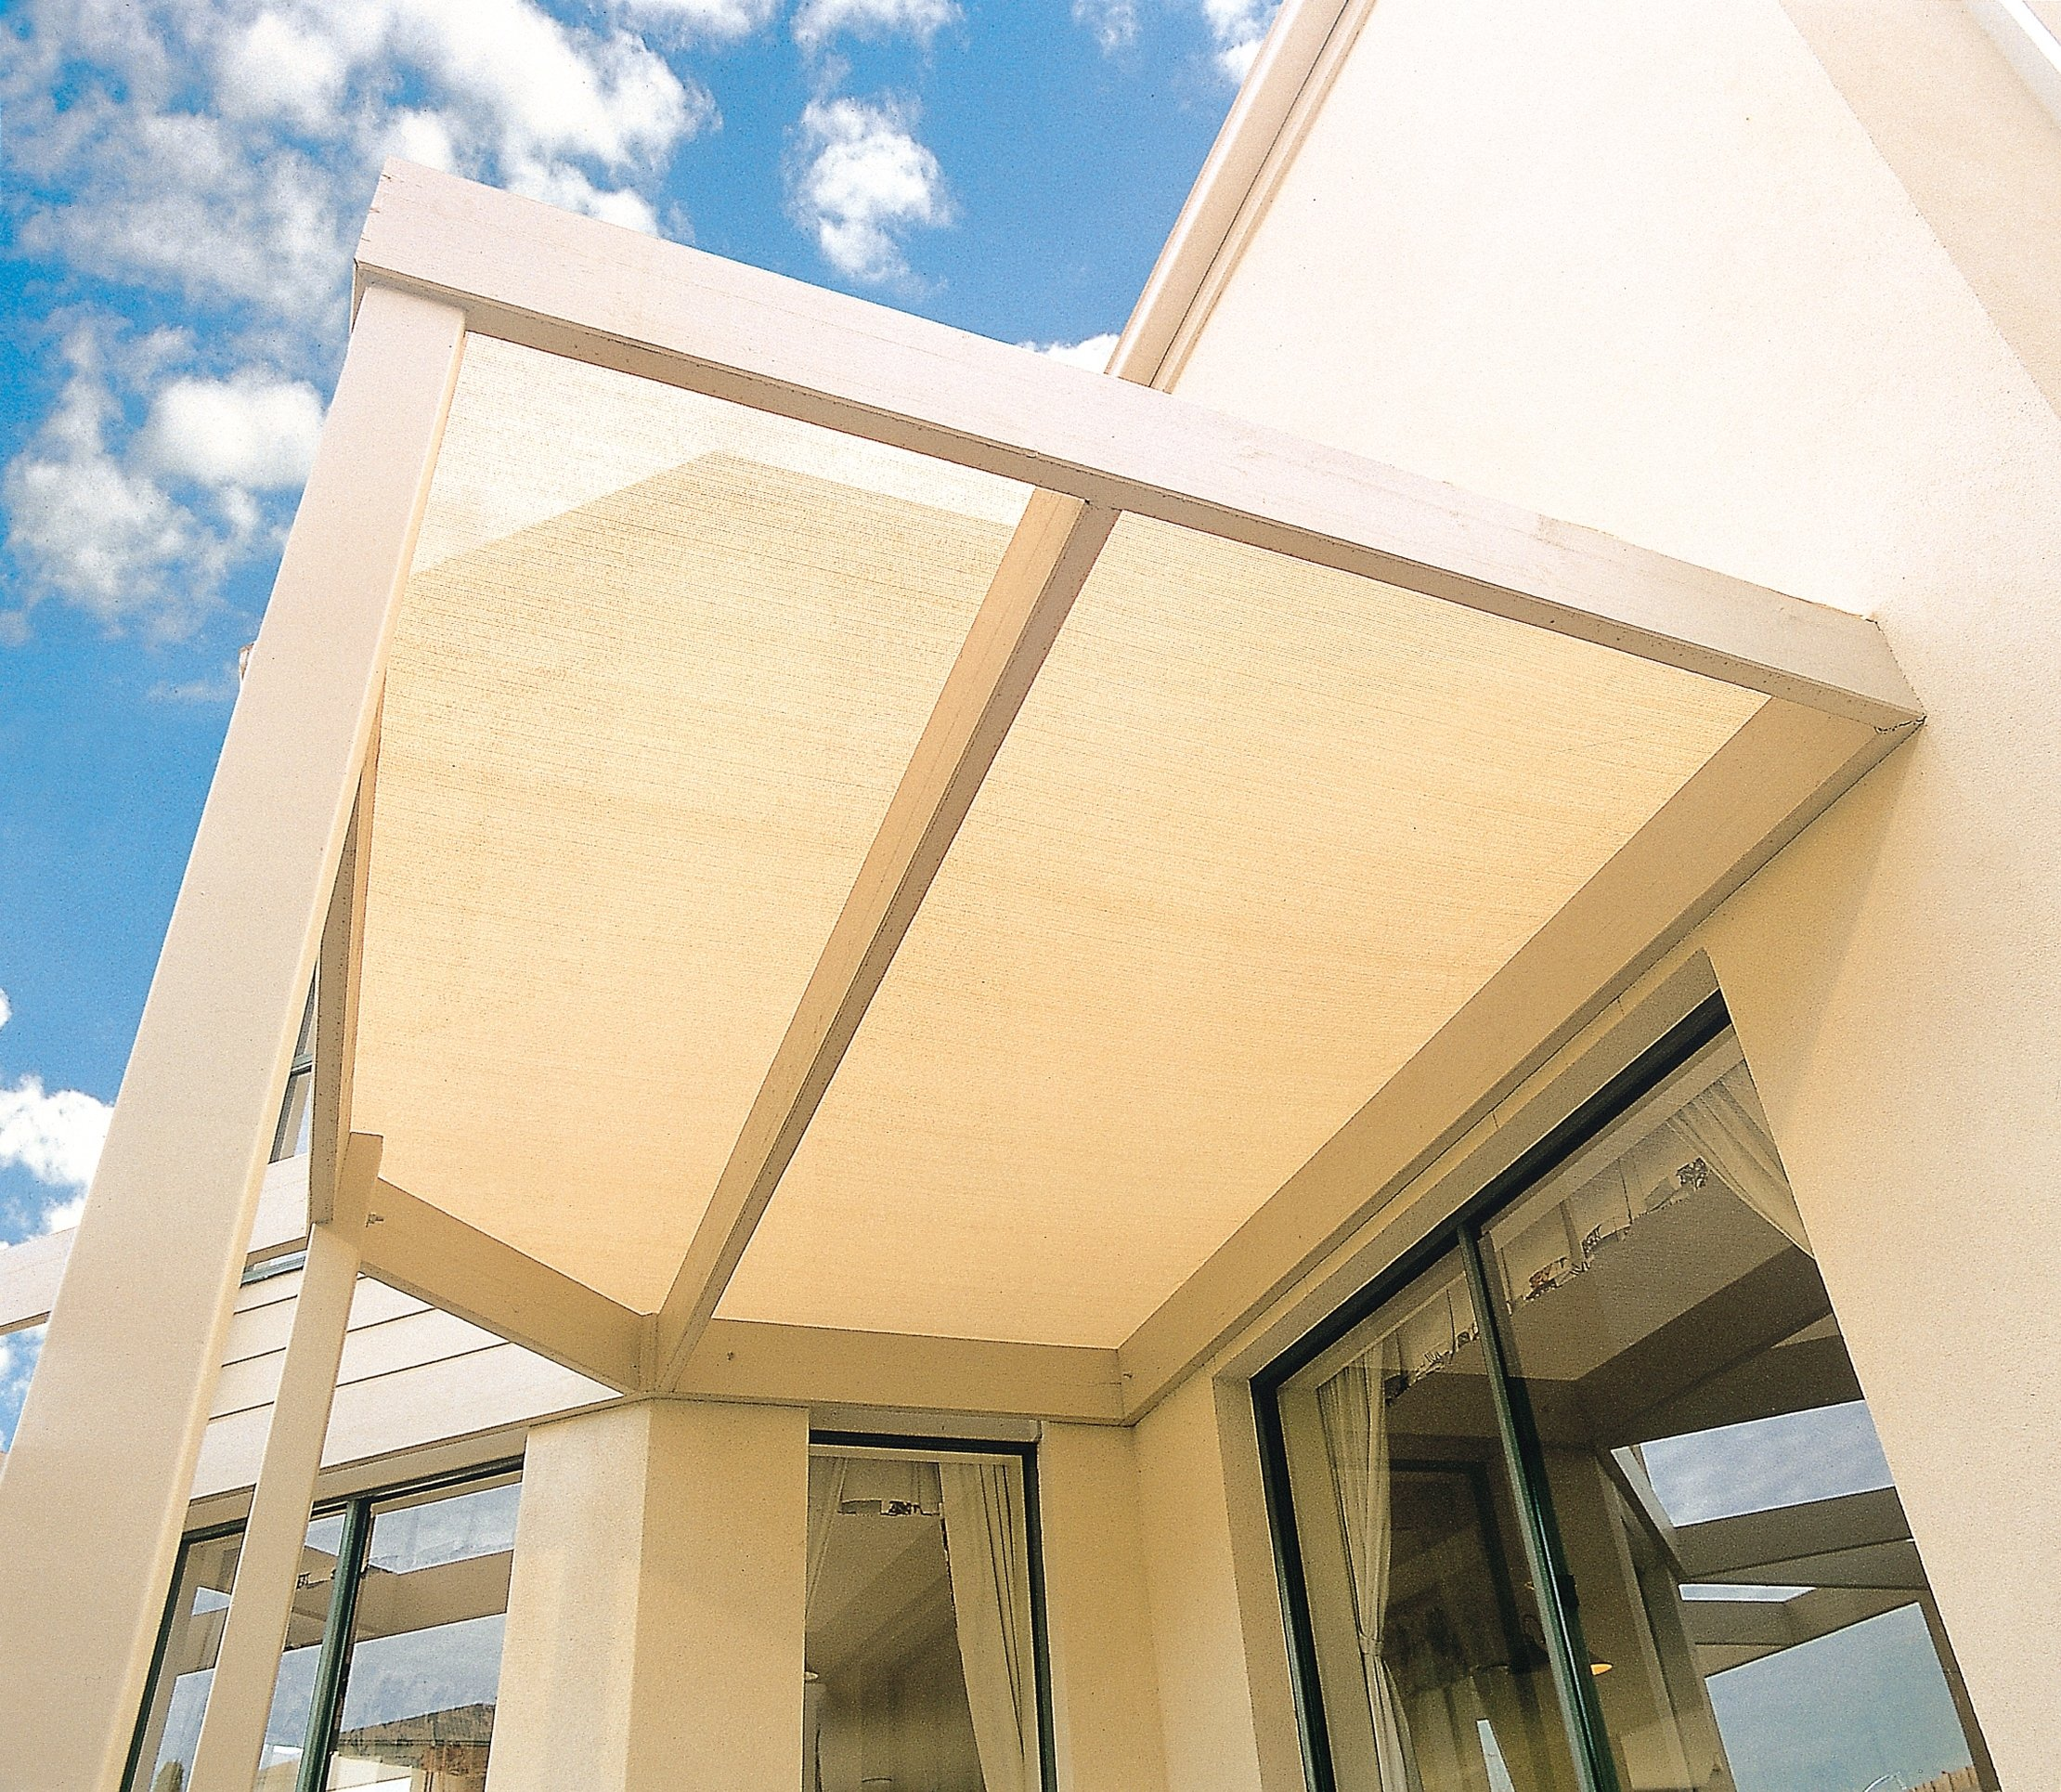 Originline Shade Cloth 4x15ft Beige 90% UV Resistant Outdoor Sun Screens for Plants/Pergola/Patio/Lawn/Garden/Greenhouse/Carport/Porch Cut Edge